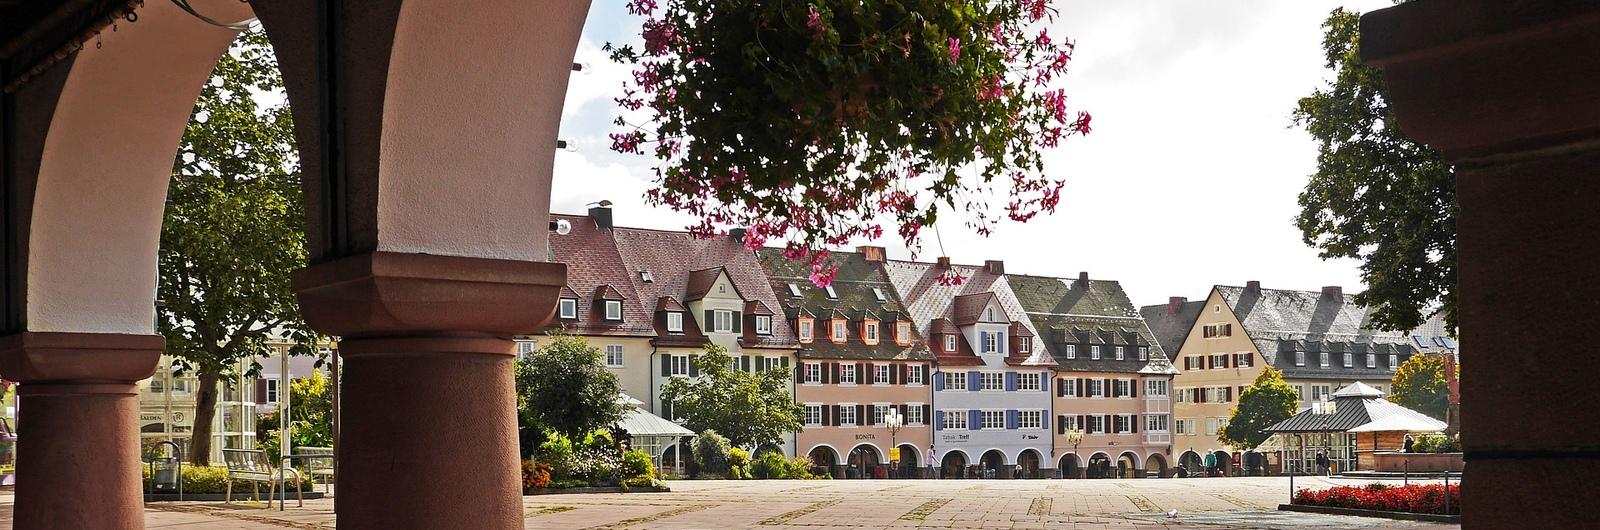 freudenstadt city header